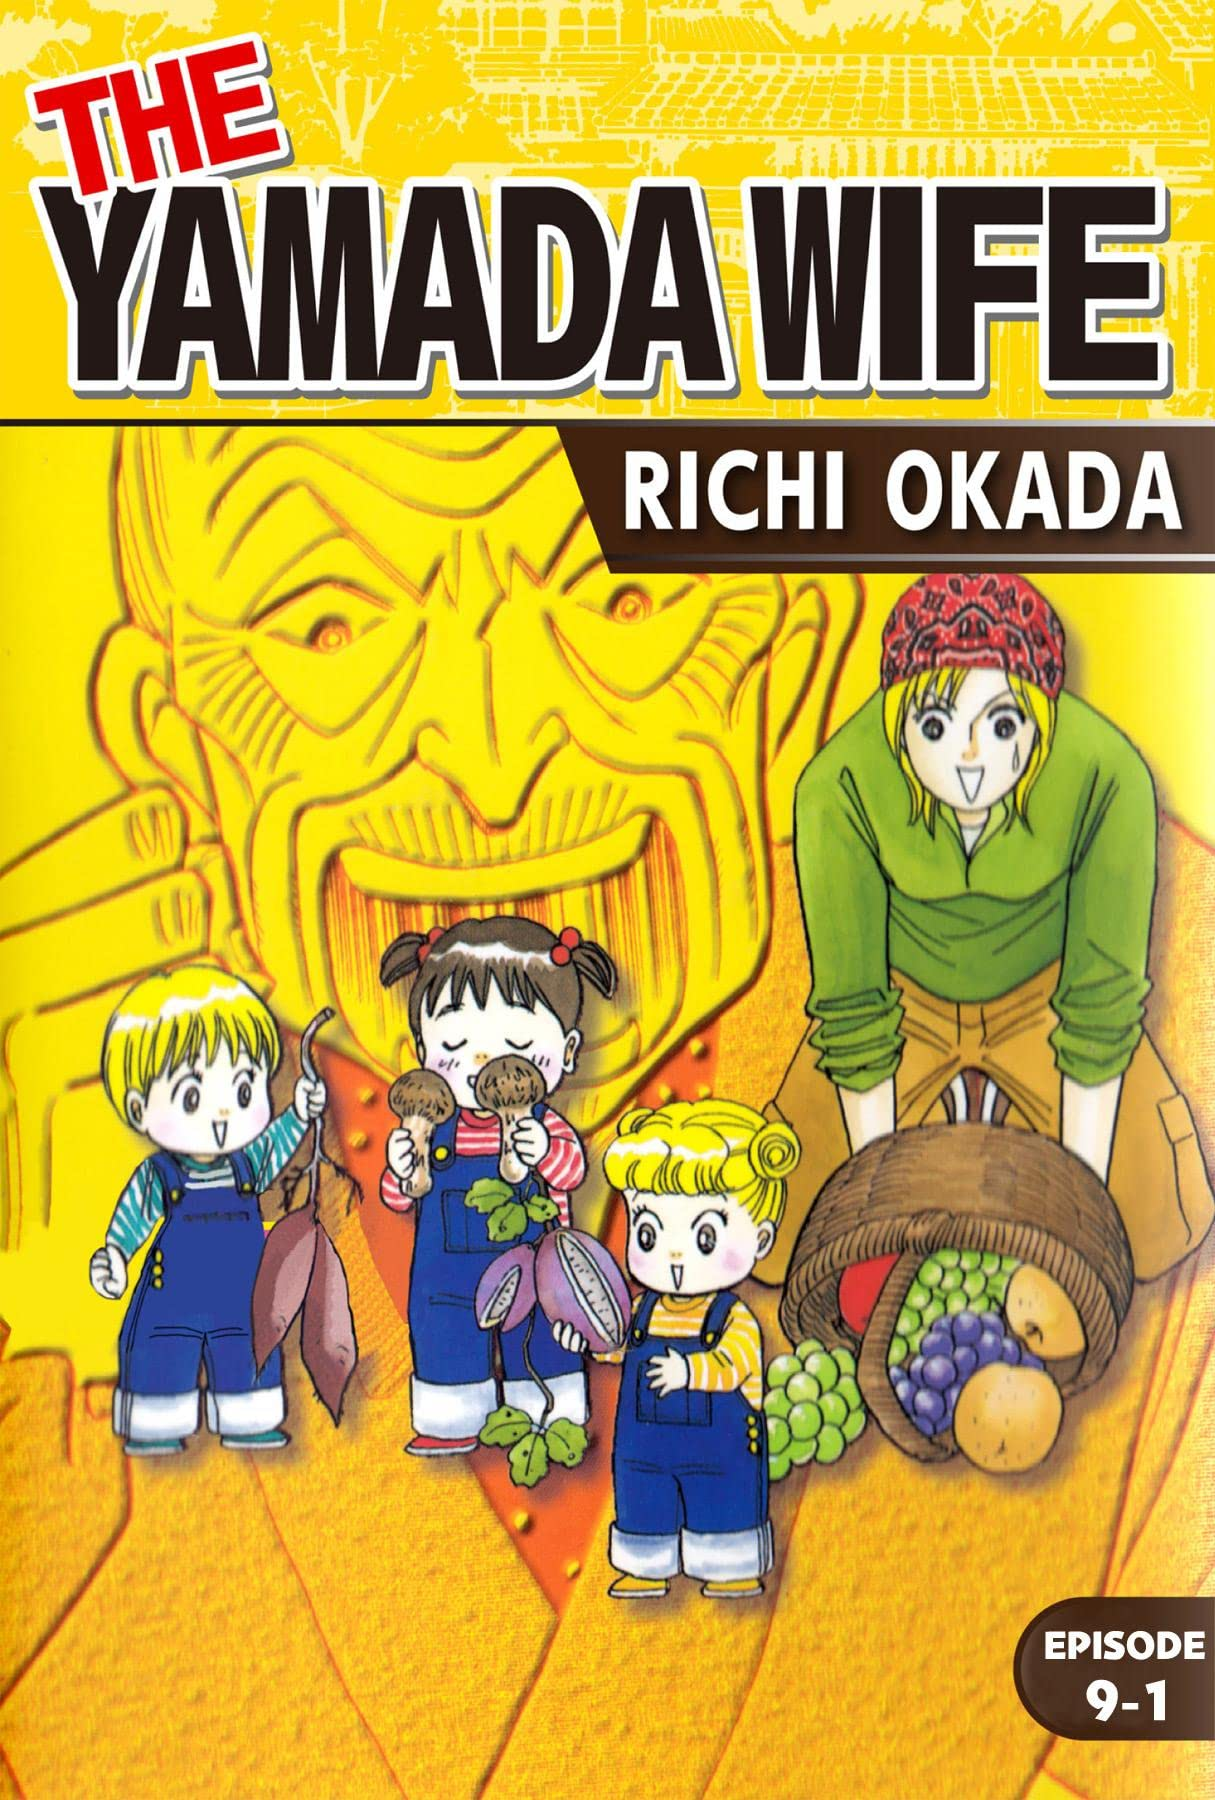 THE YAMADA WIFE #57